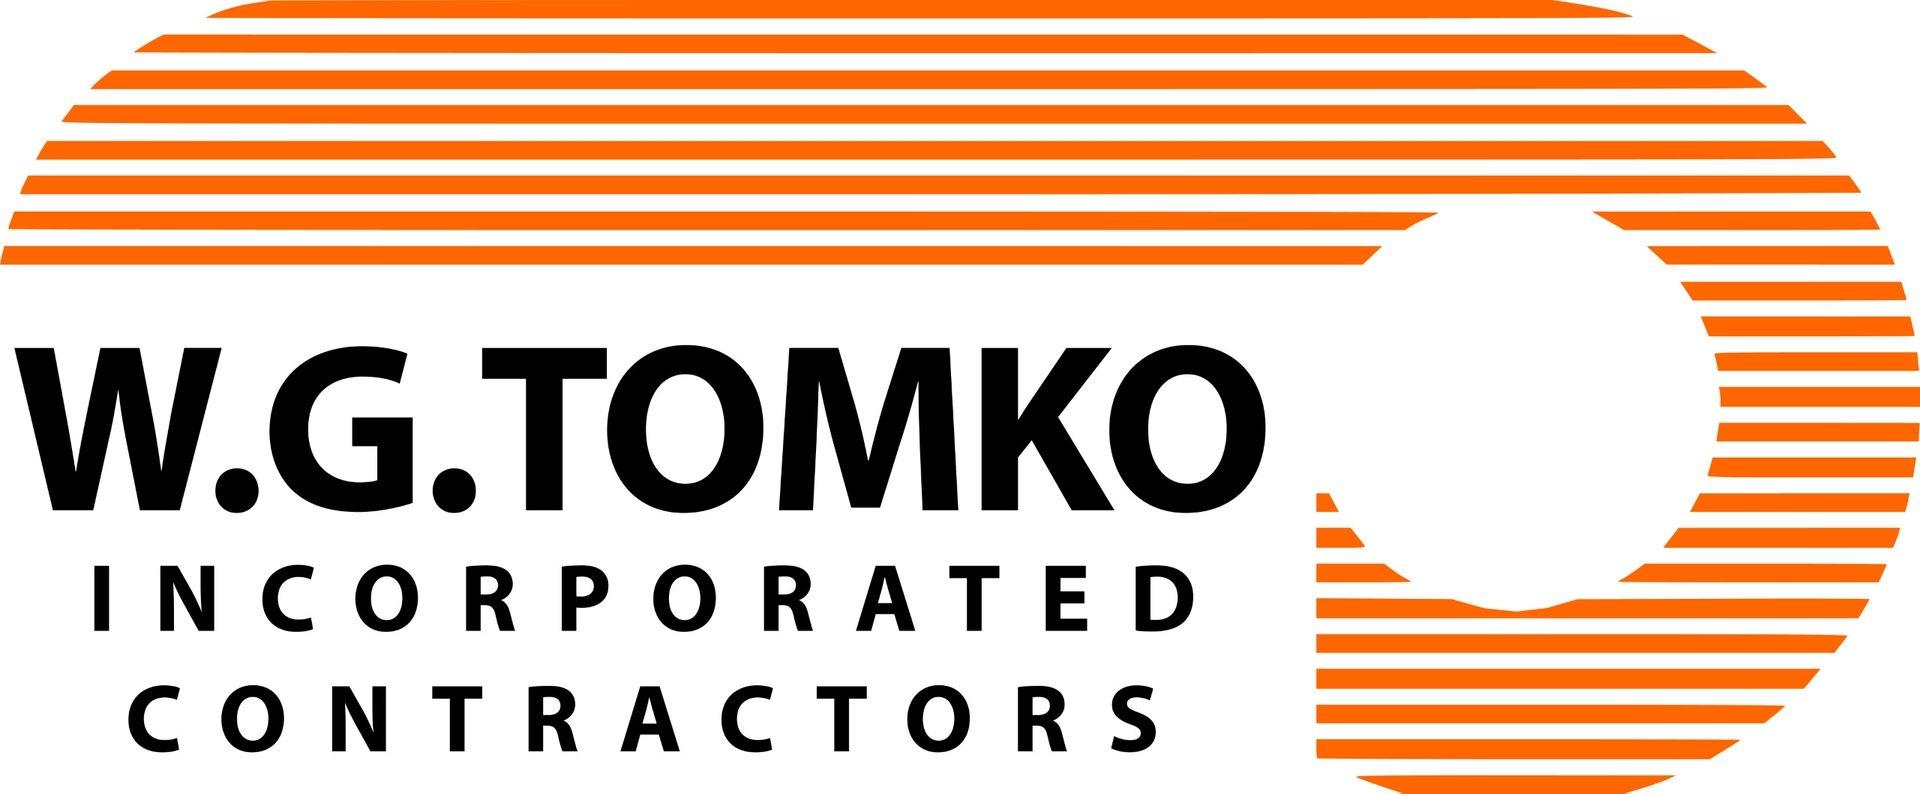 W.G. Tomko Inc. company logo